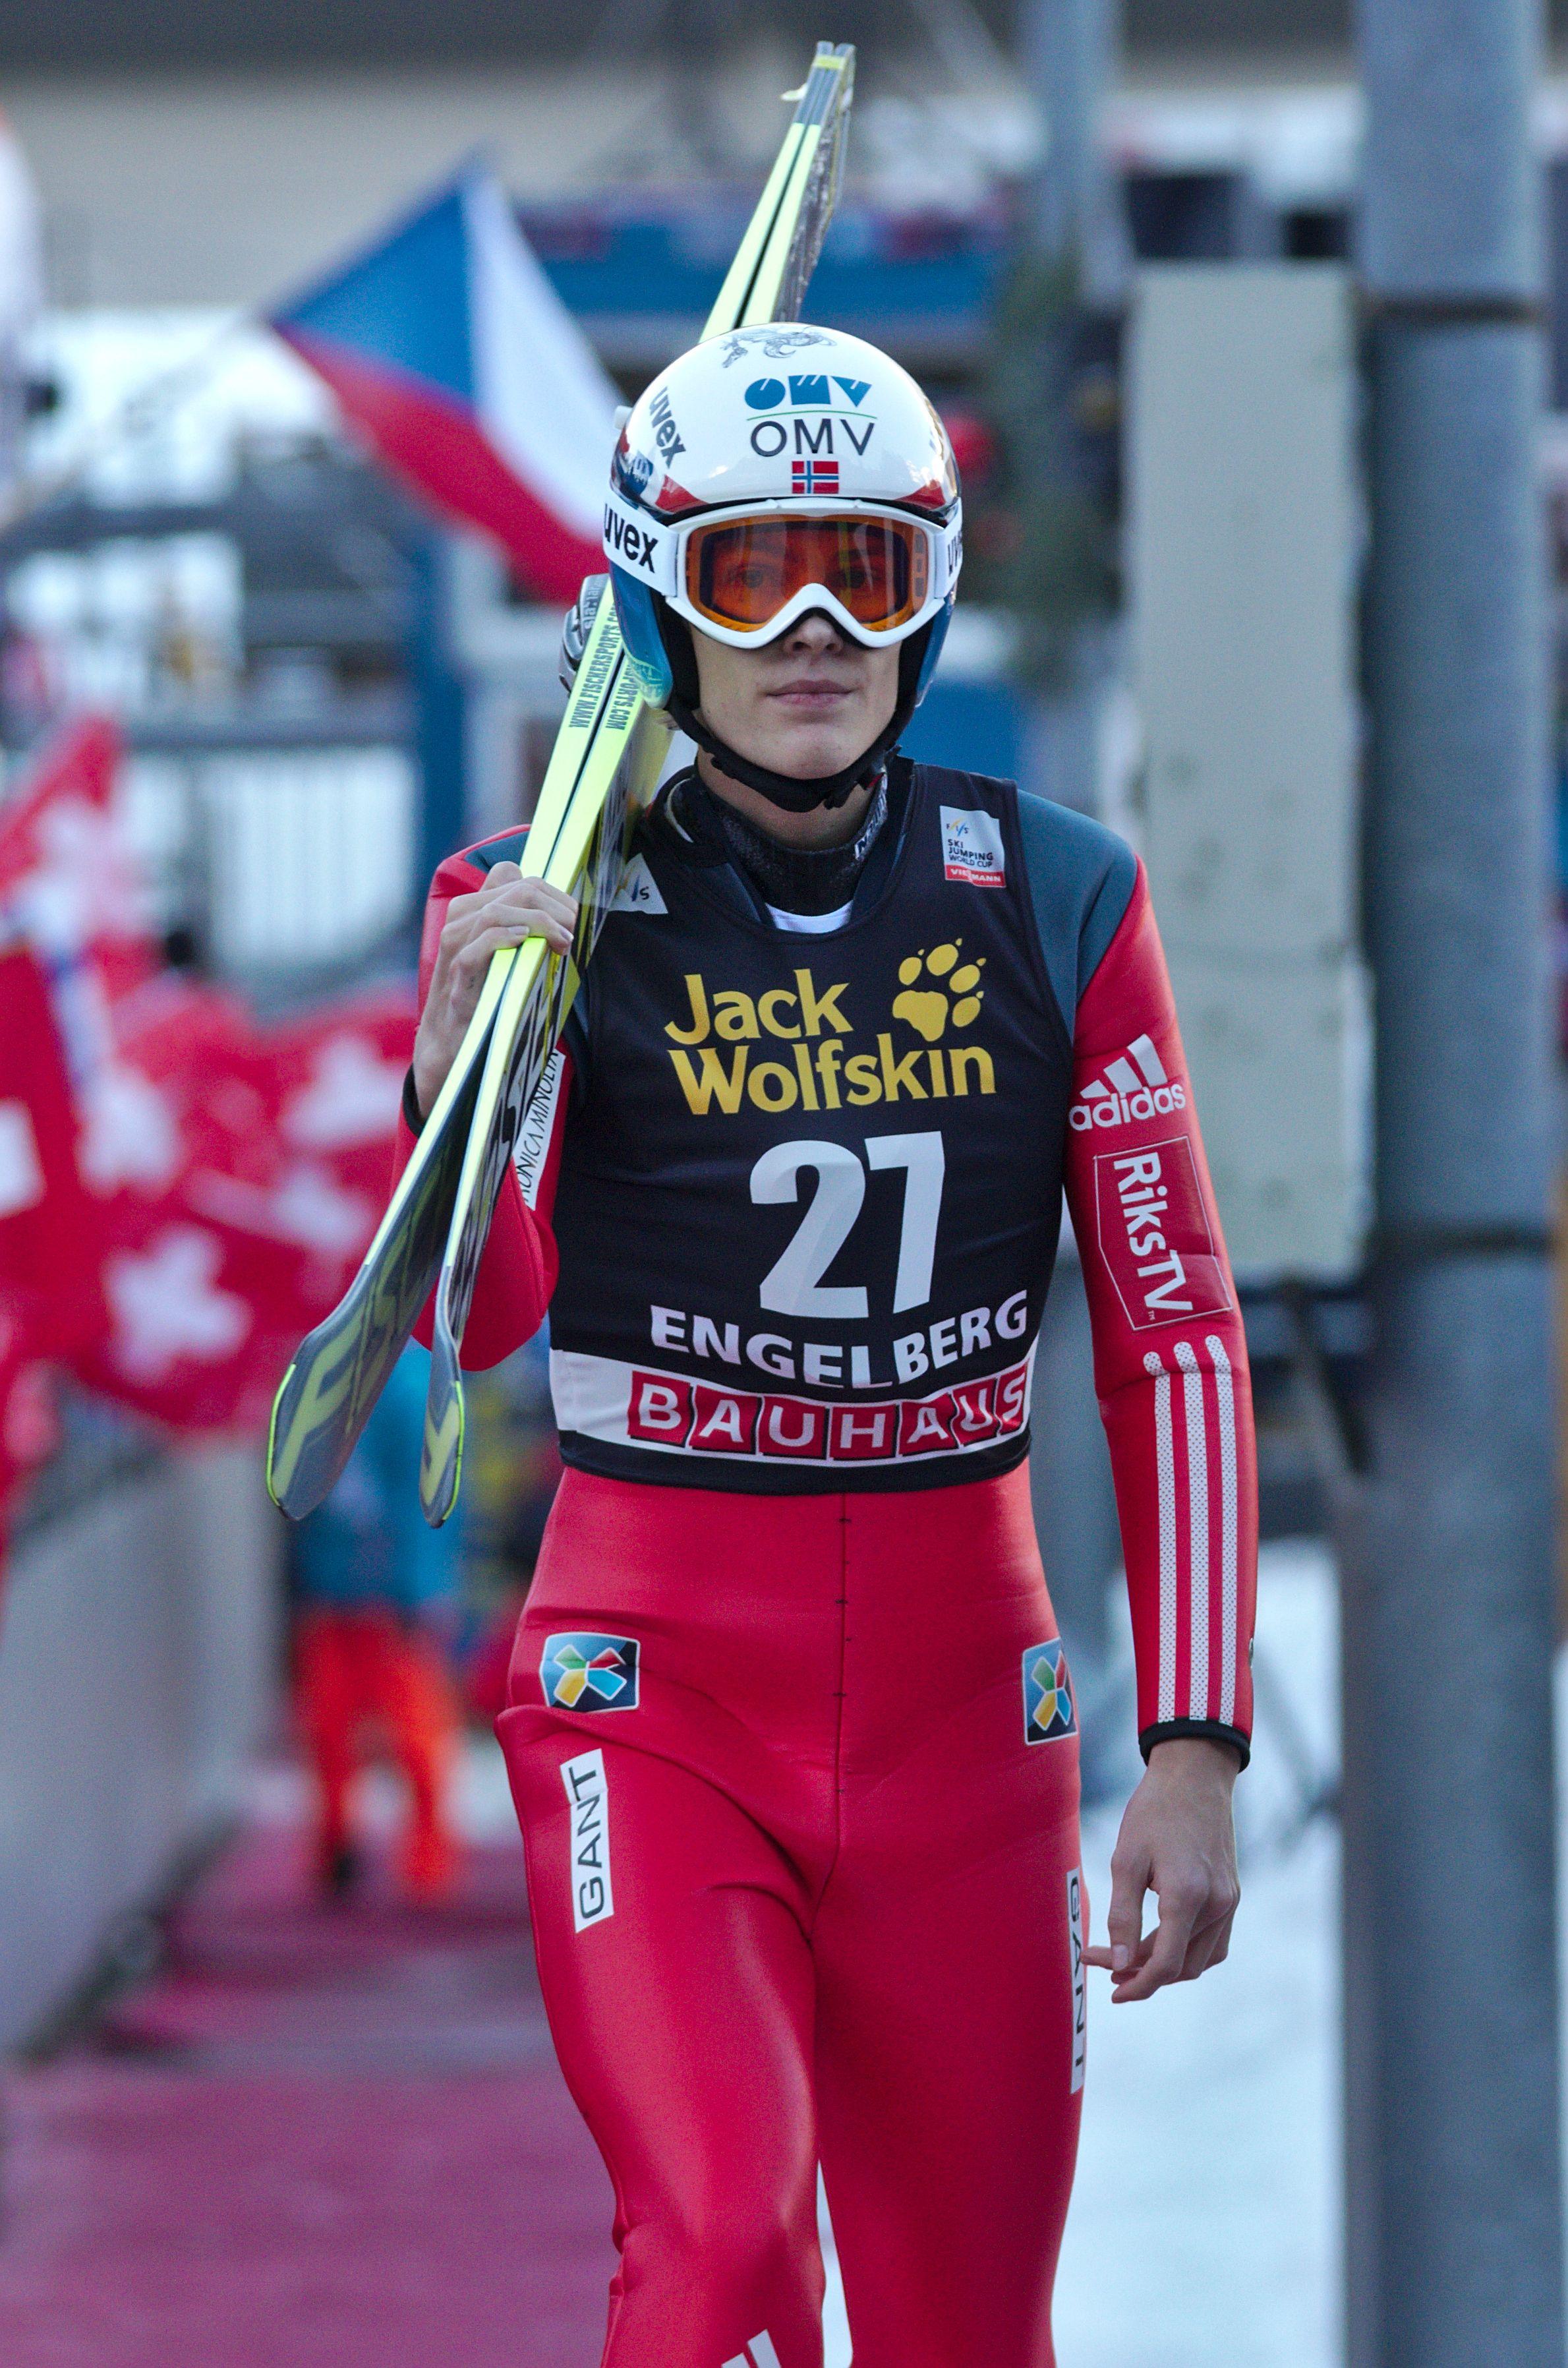 FileFIS Ski Jumping World Cup 2014 Engelberg 20141220